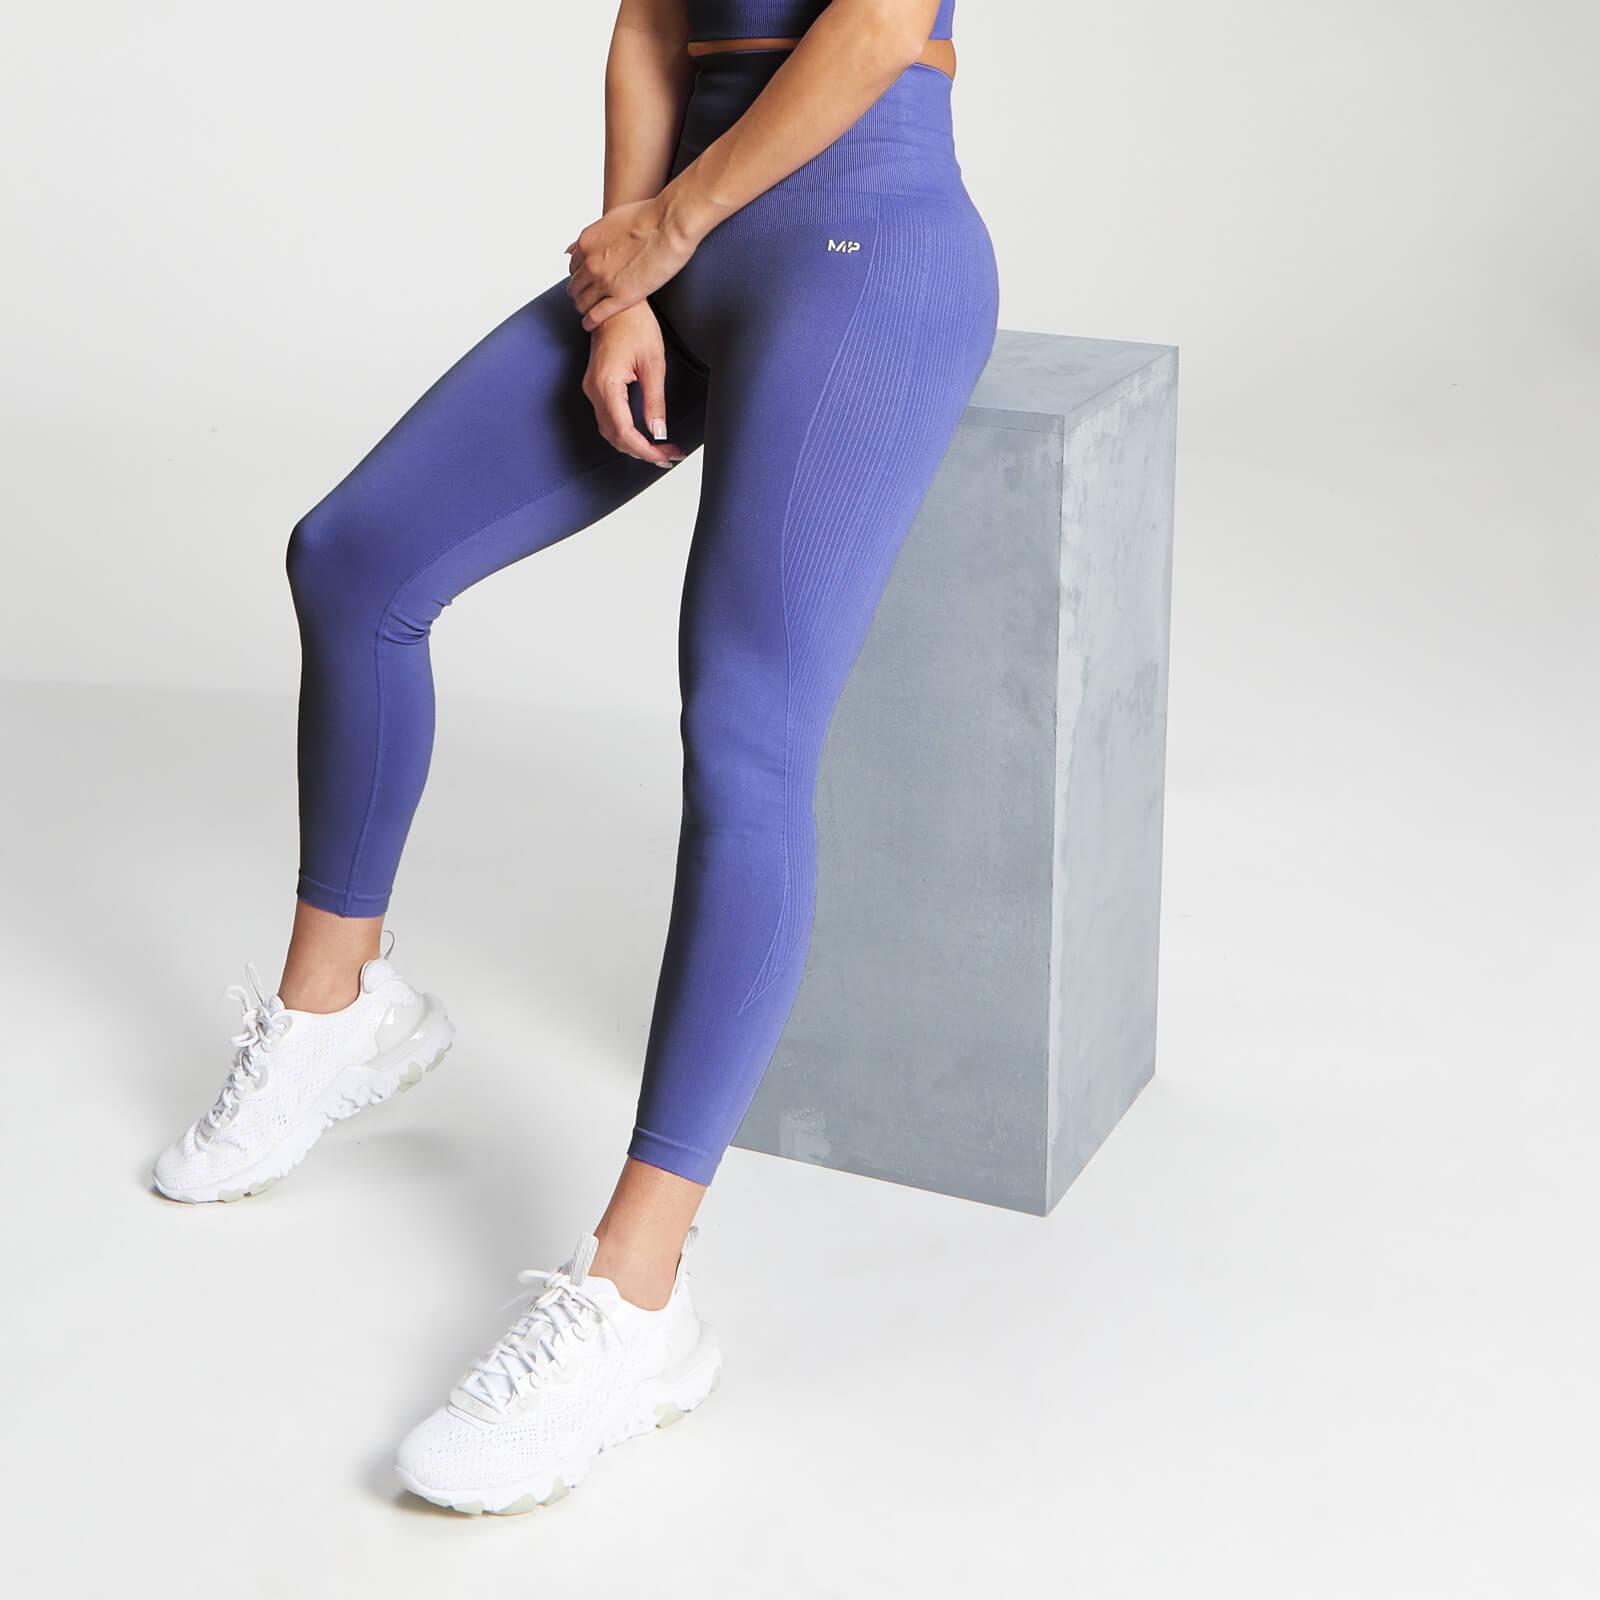 Купить MP Women's Shape Seamless Ultra 7/8 Leggings - Bluebell - XXS, Myprotein International